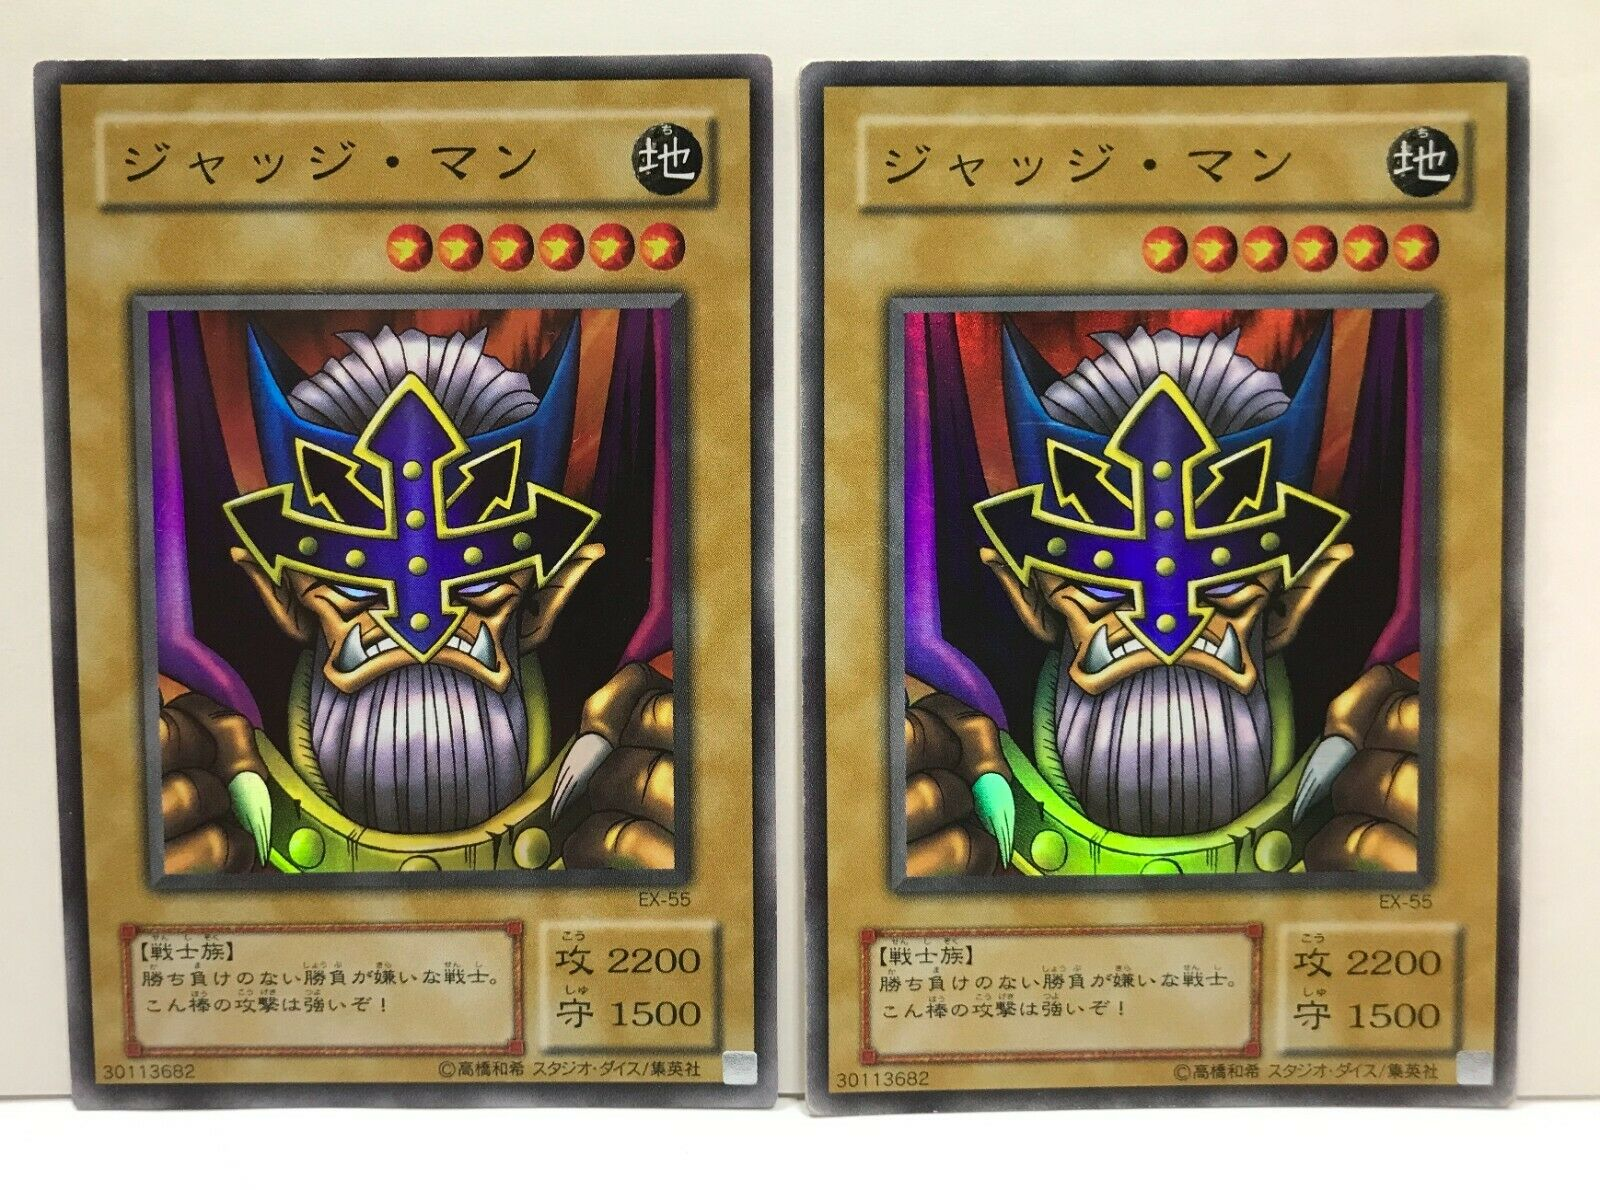 Judge Man Japanese - EX-55 Super Rare Unlimited Near Mint Non-English 5ZK